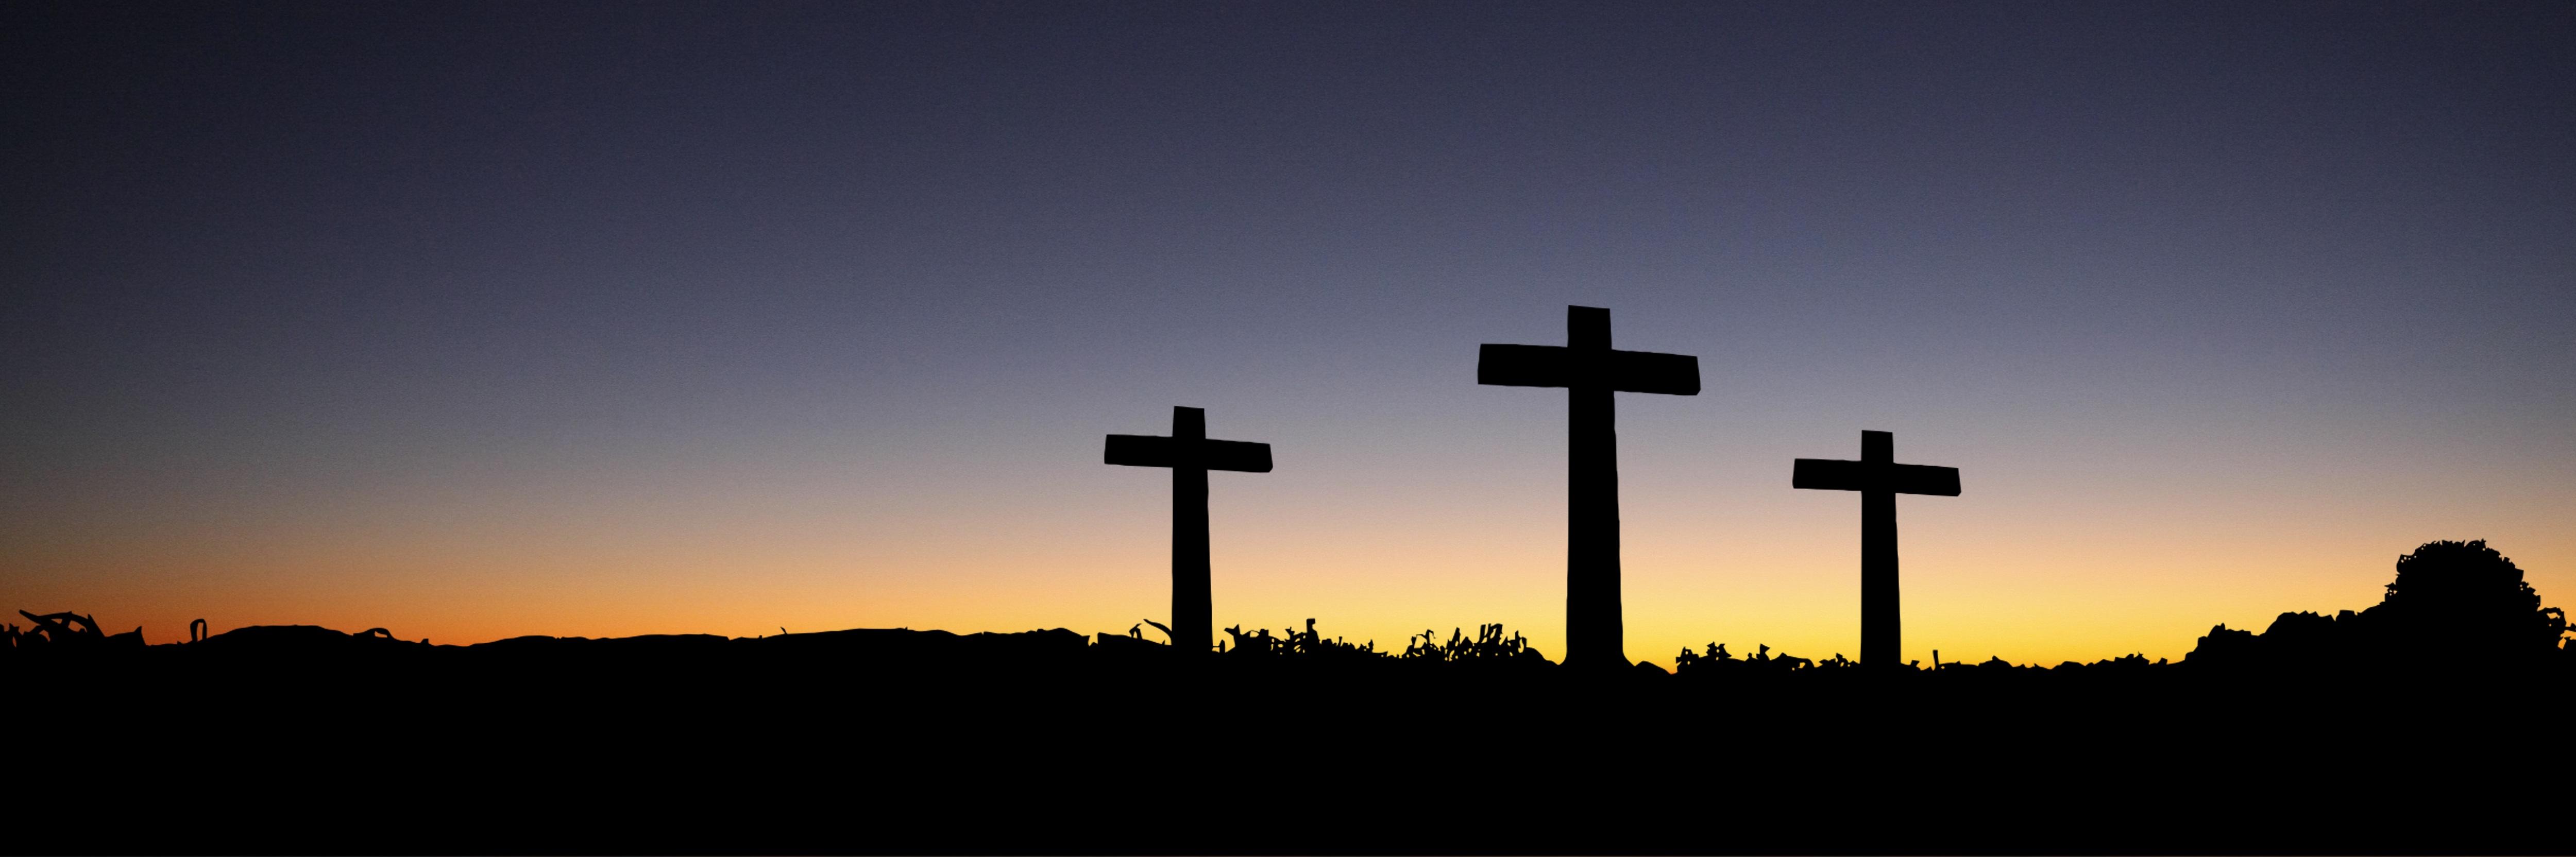 horizon-silhouette-sky-sun-sunrise-sunset-645931-pxhere_com.jpg